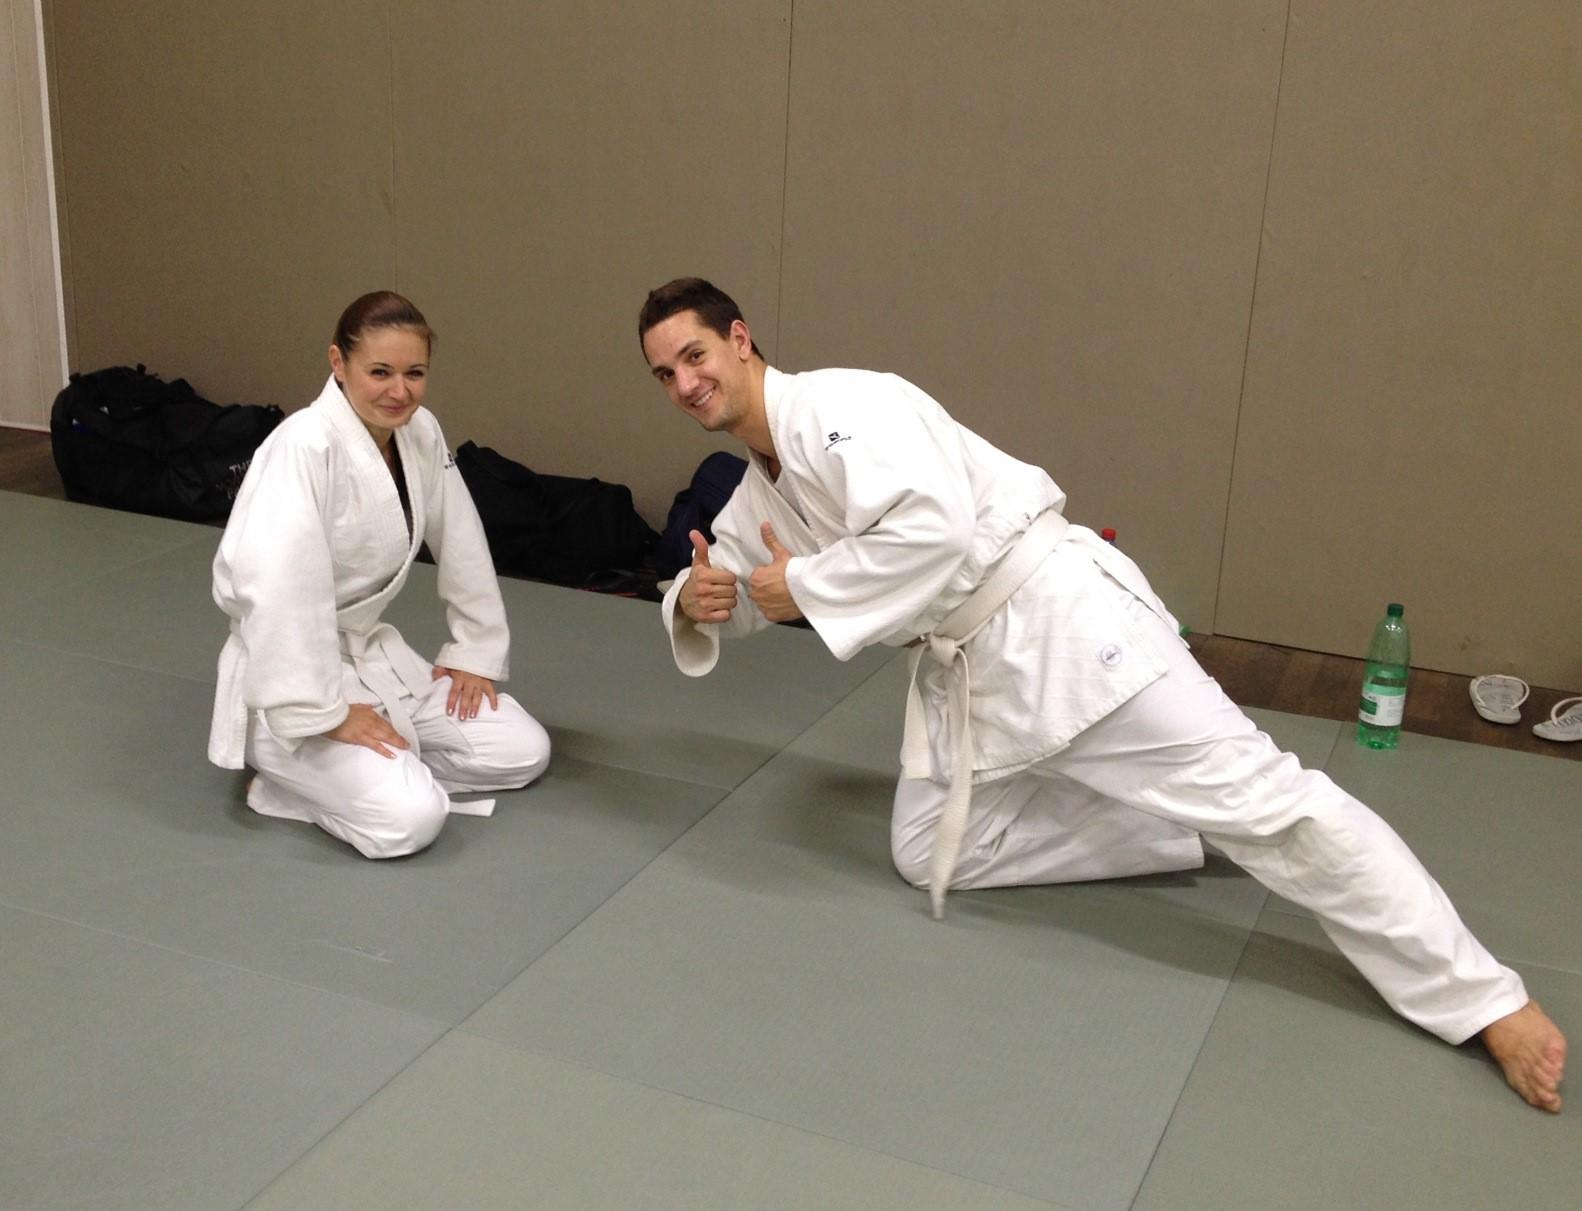 jujitsu-efjjsd-novembre-2013 6